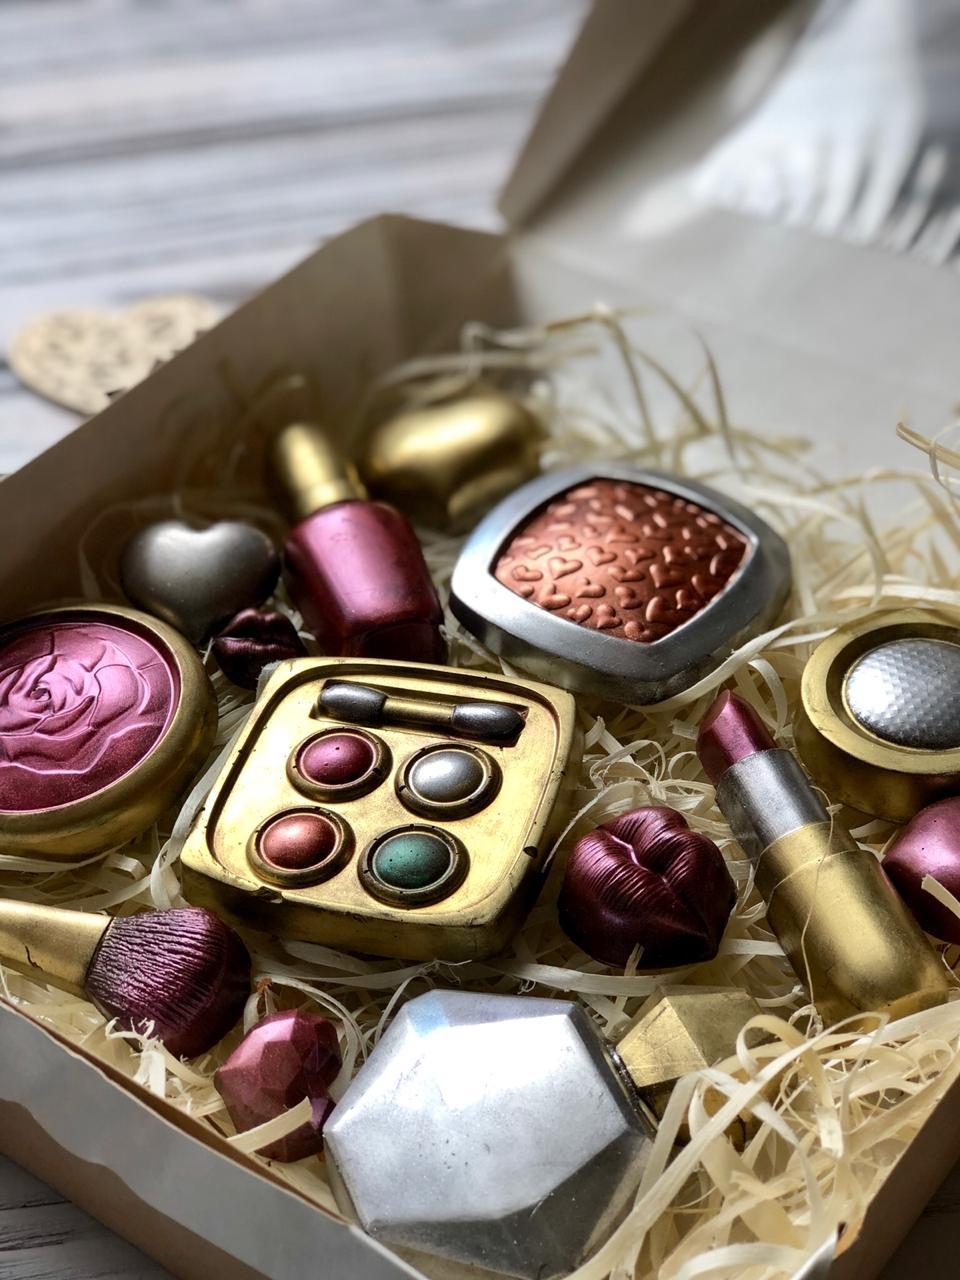 Chocolate купить косметику купить косметики из индии